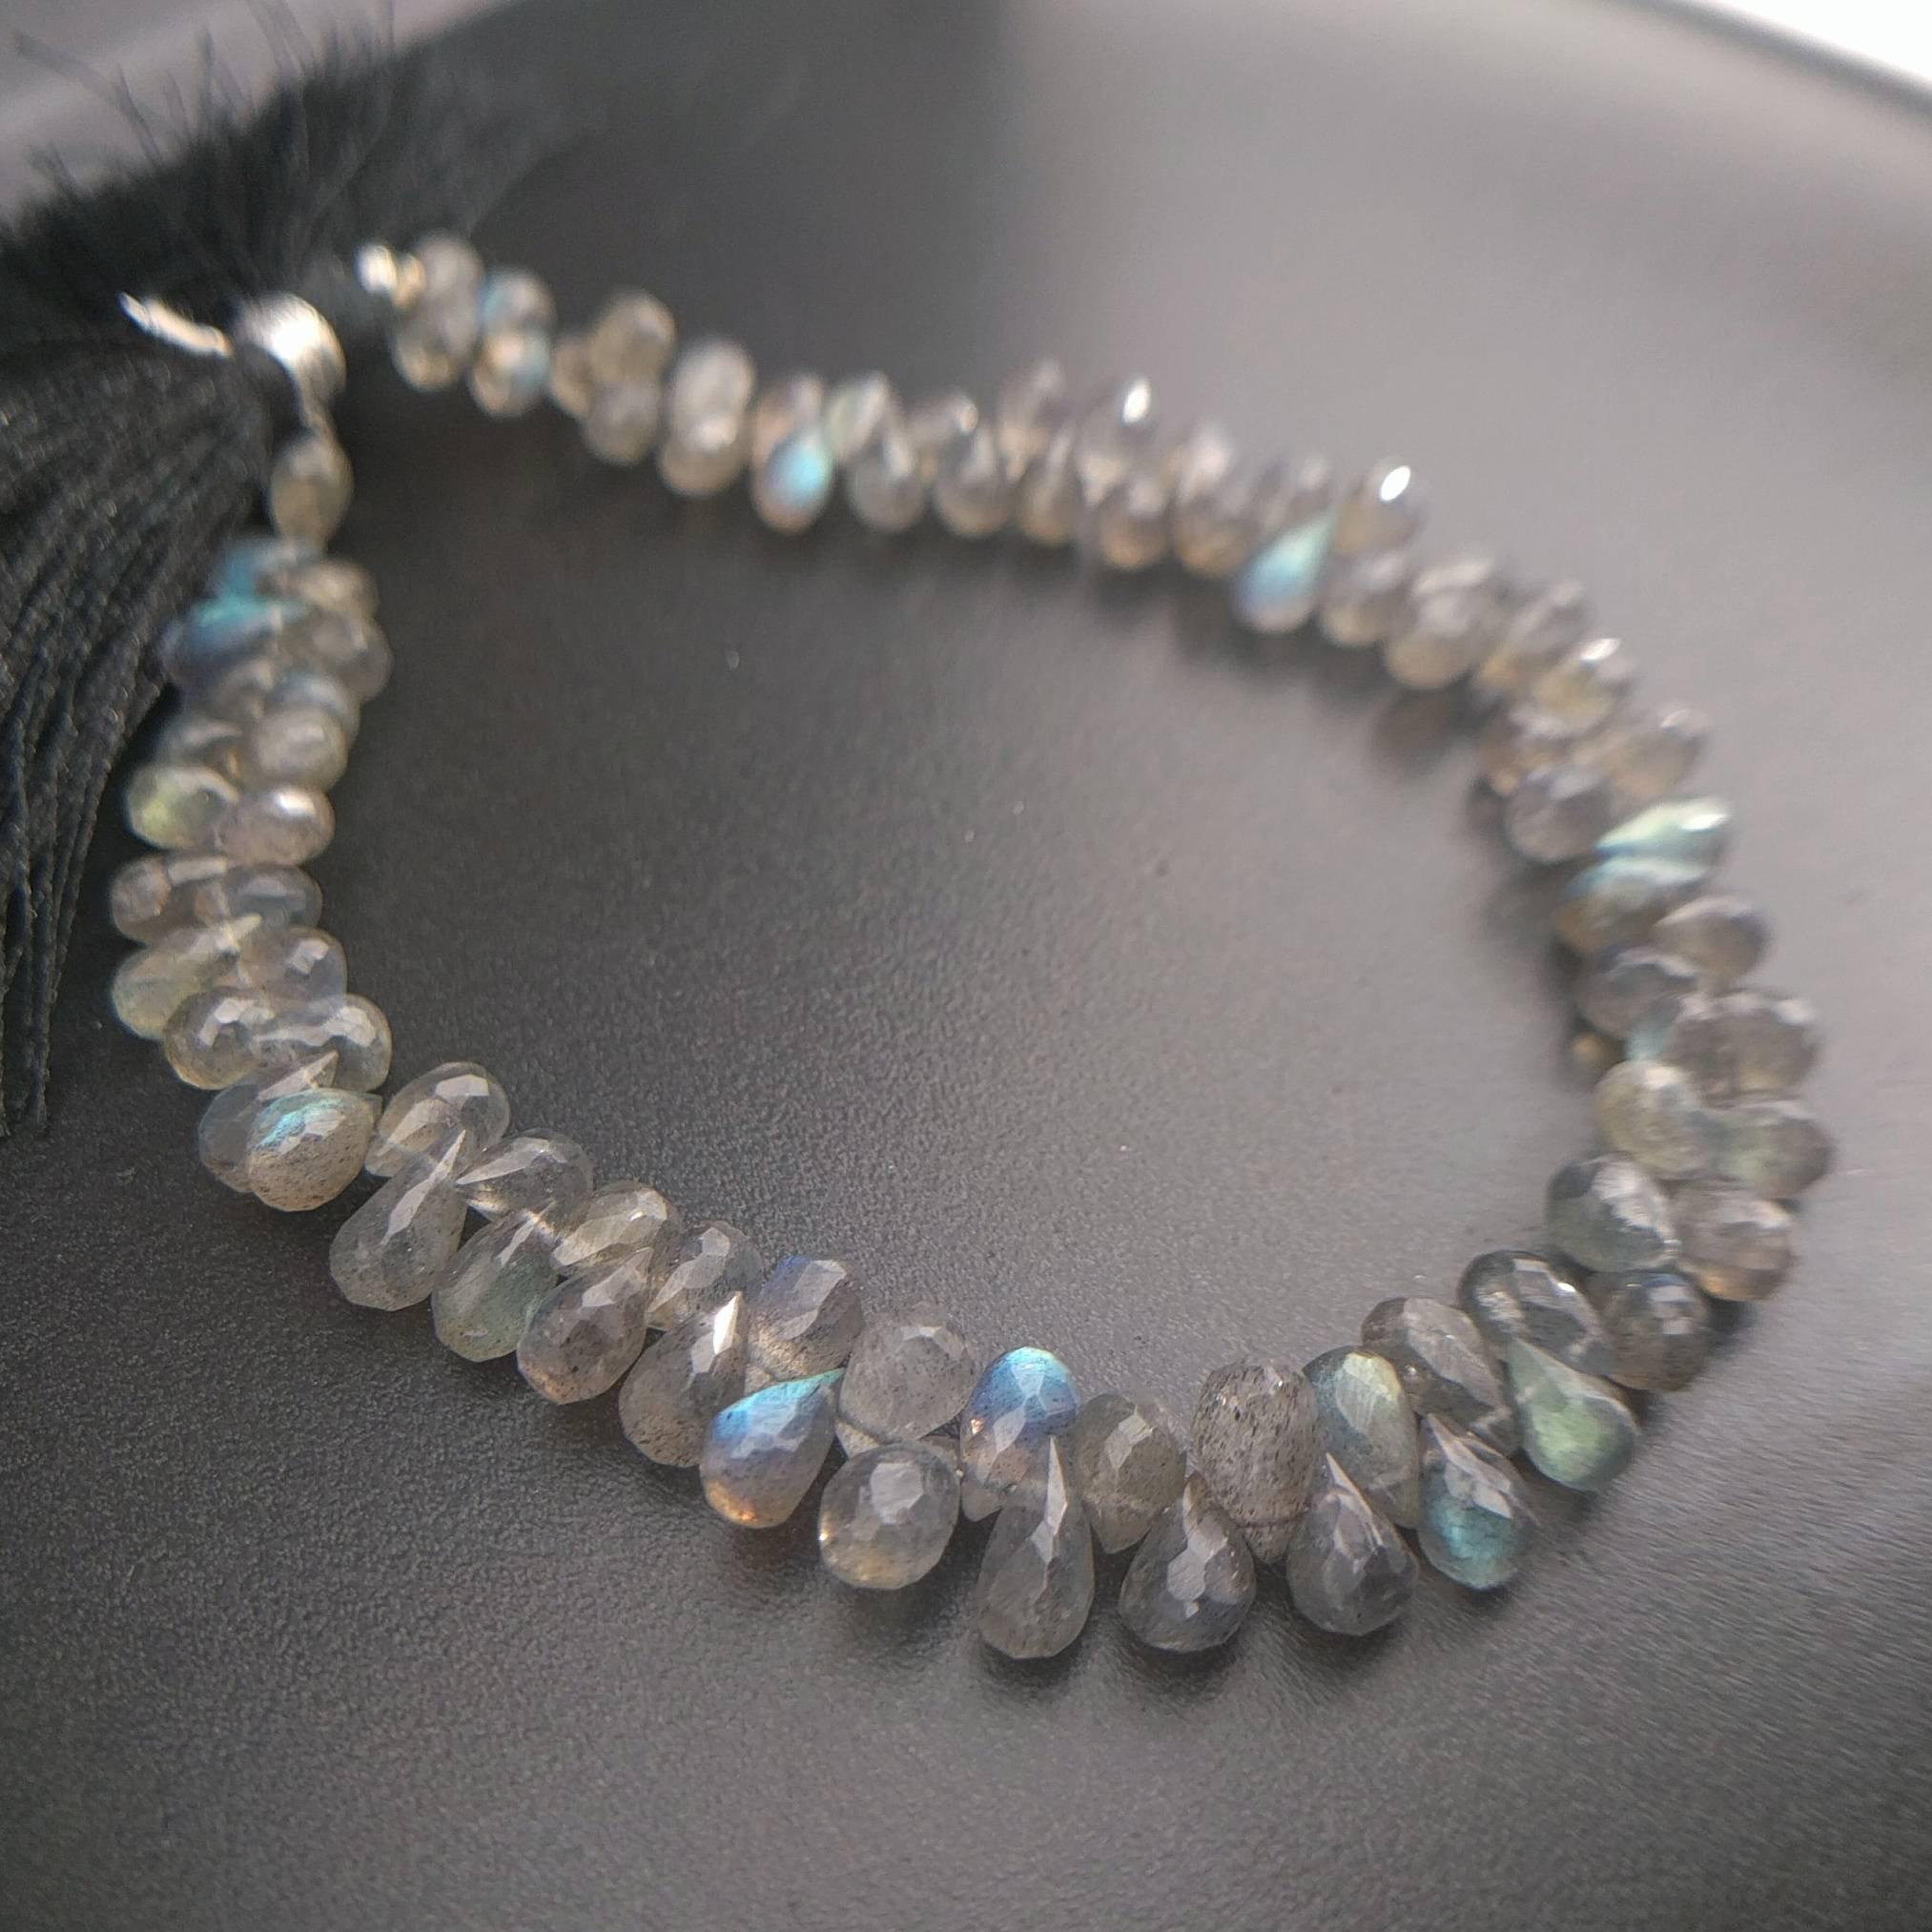 Petite Labradorite Gemstone Teardrop Briolette Pendant with Electroplated Silver Cap and Bail S17B1-10 bgt